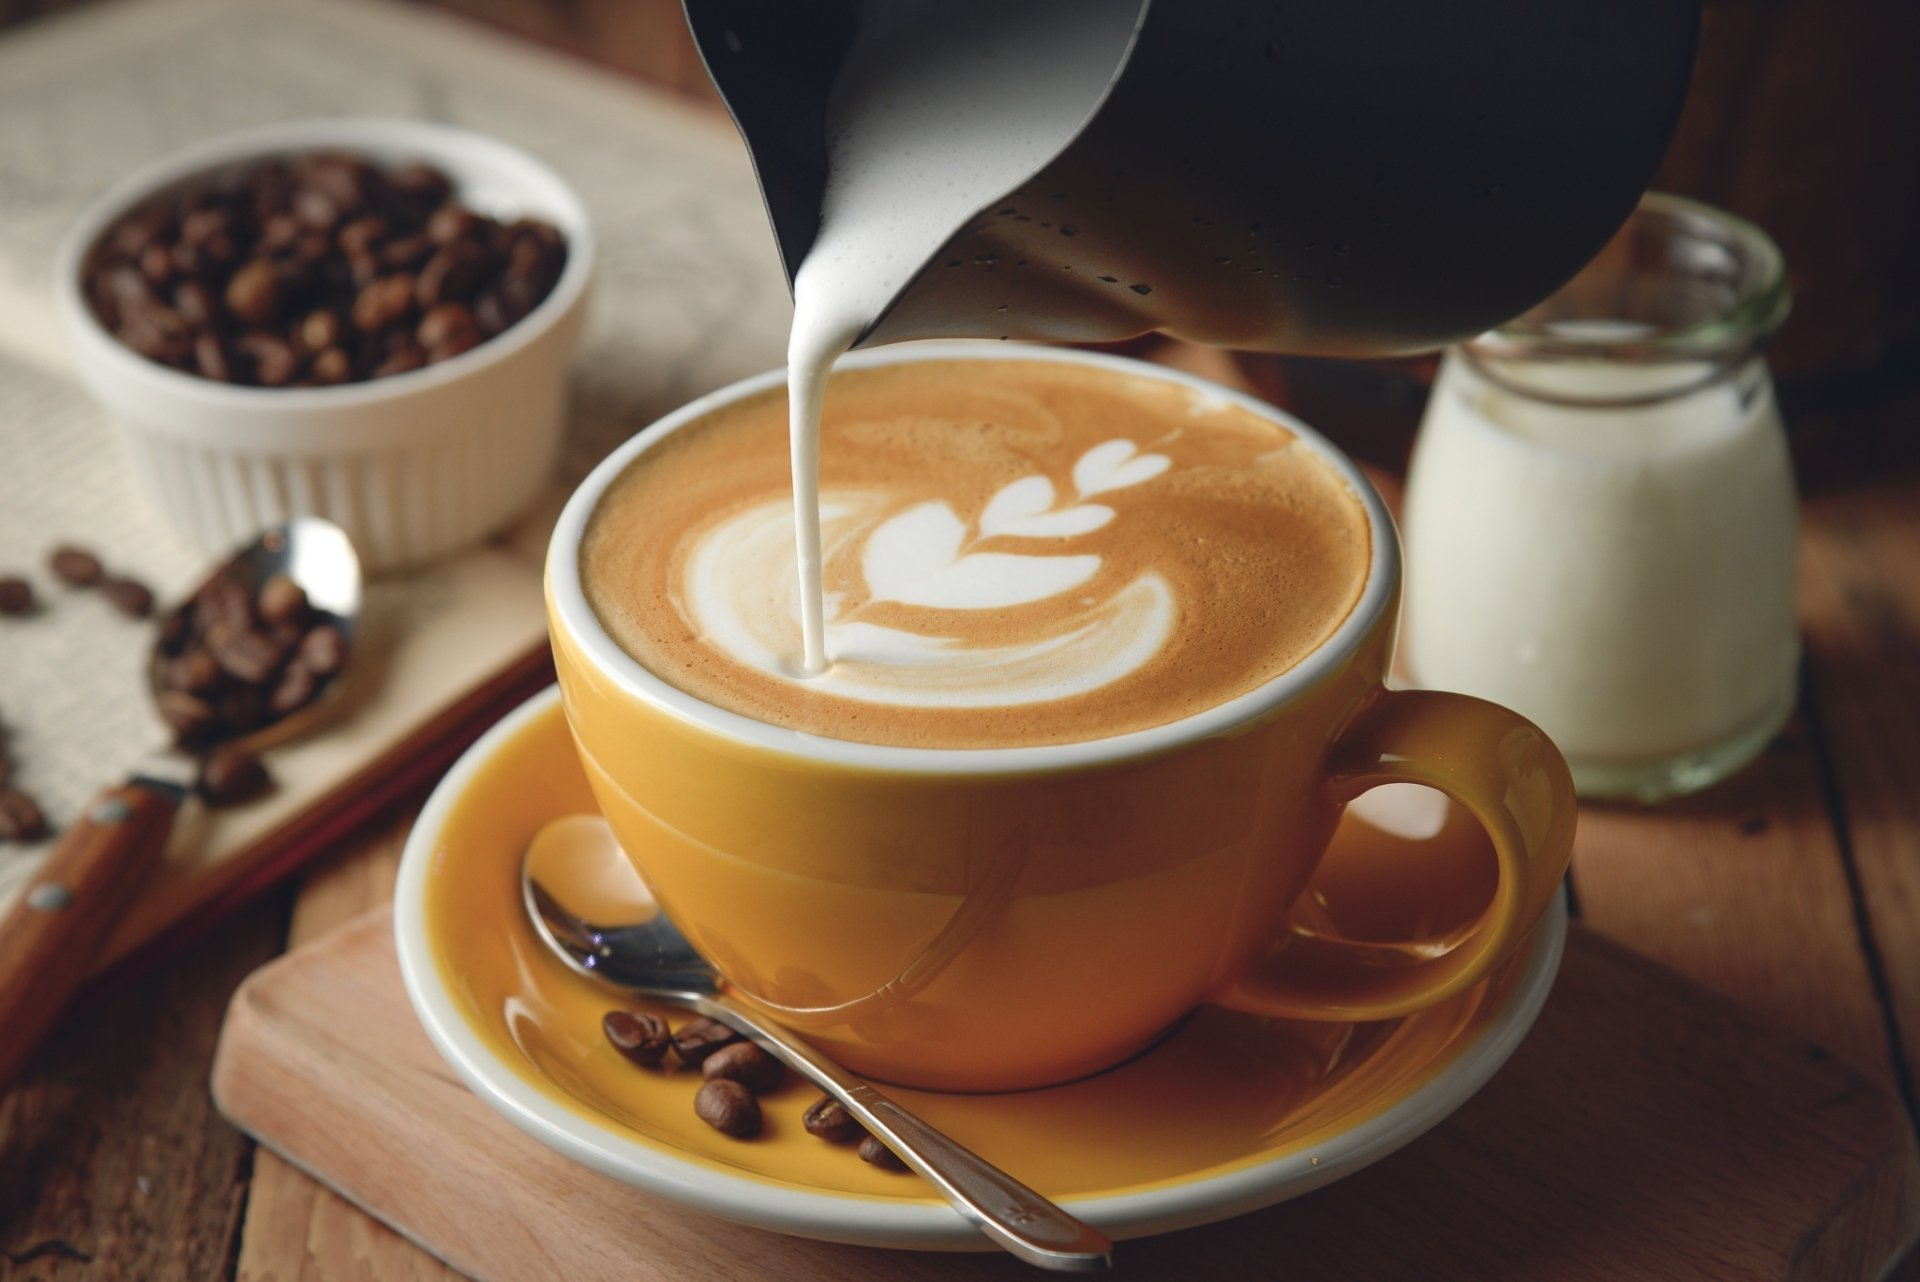 Food - Coffee  Cup Coffee Beans Milk Wallpaper